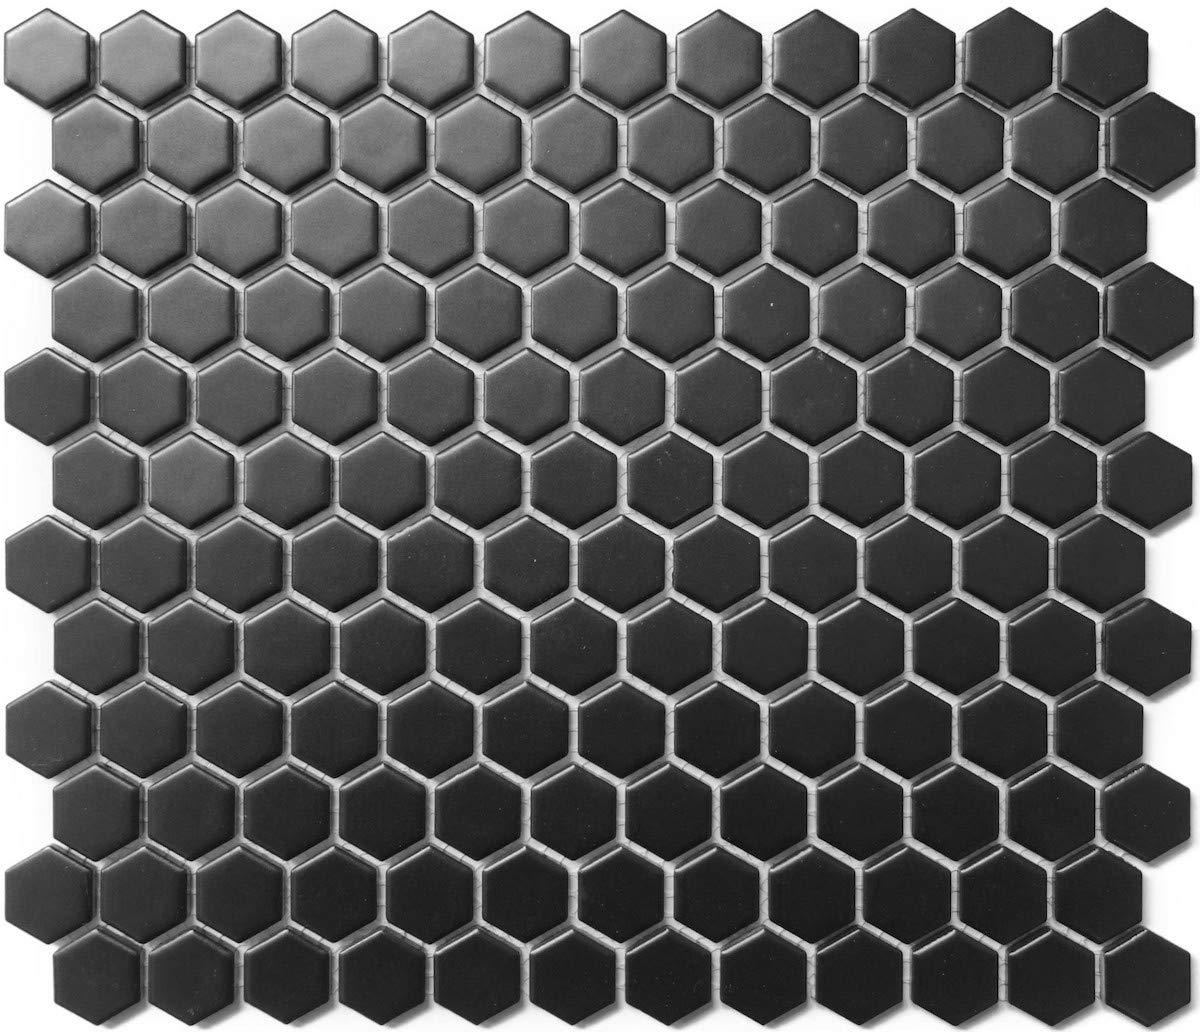 1 Carton/10 SQFT | Black 1'' Hexagon Mosaic Tile (Matte) by Thomas Avenue Ceramics